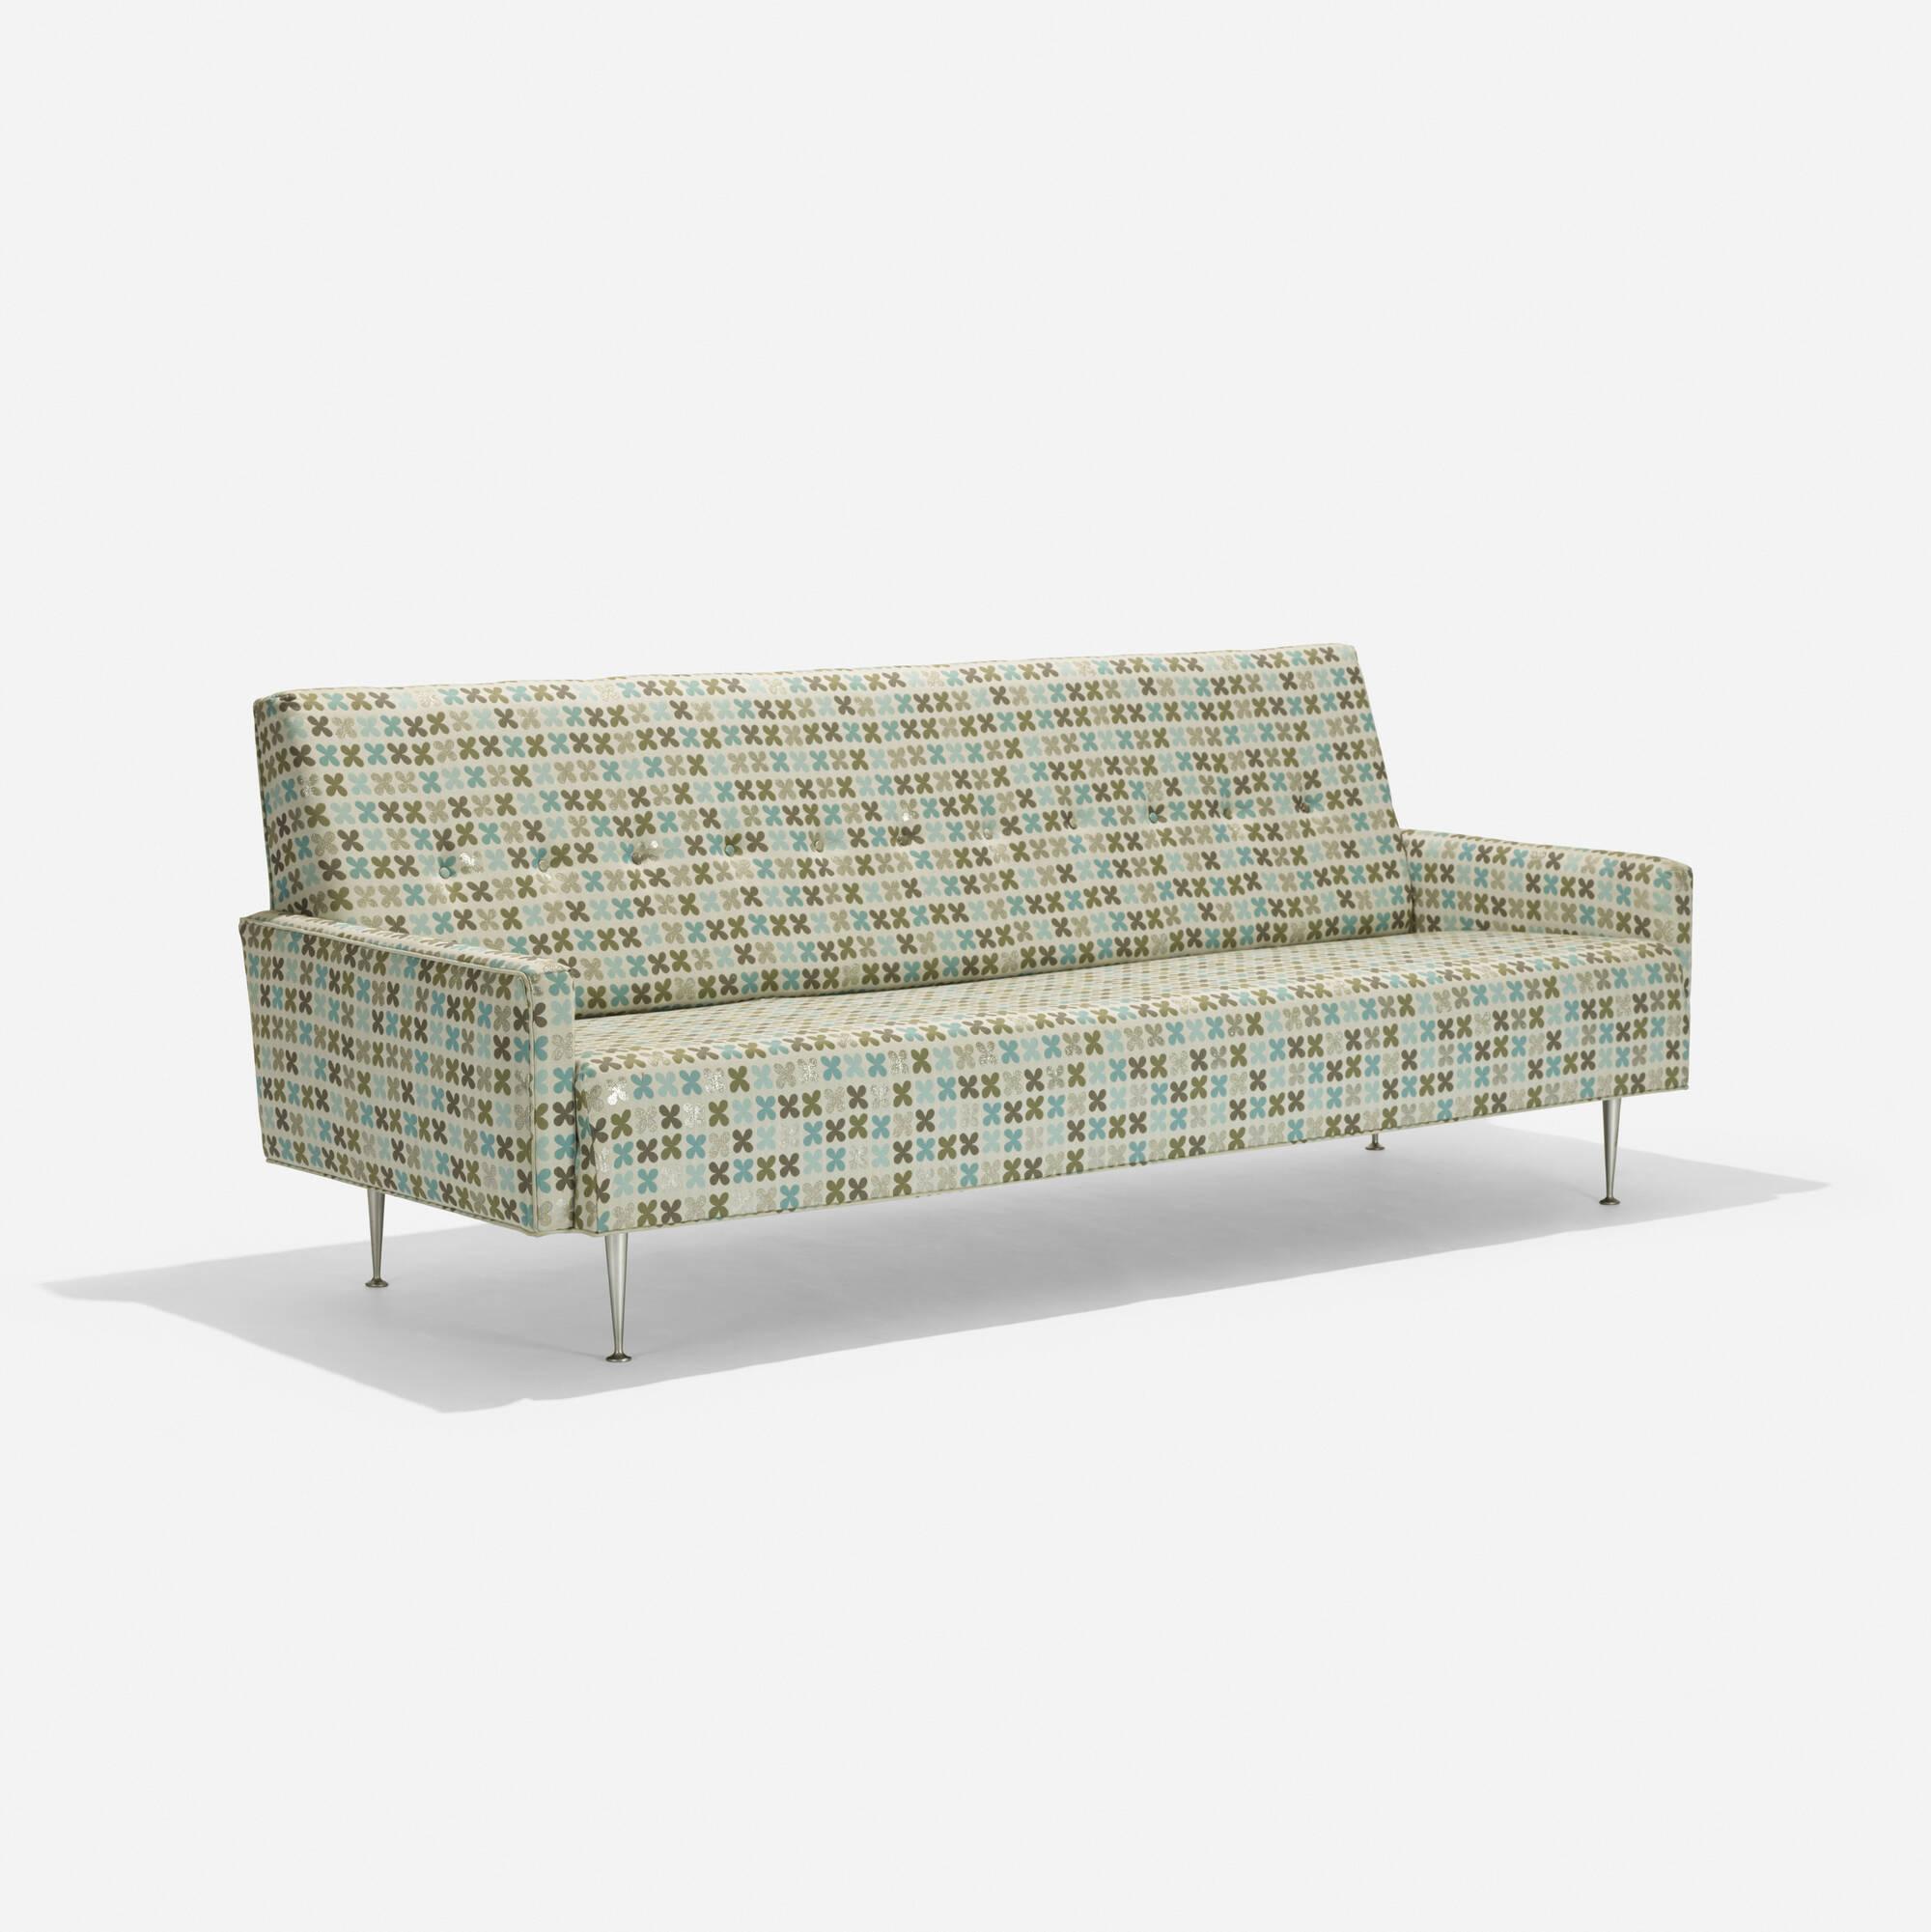 107: George Nelson & Associates / sofa, model 5486 (1 of 2)